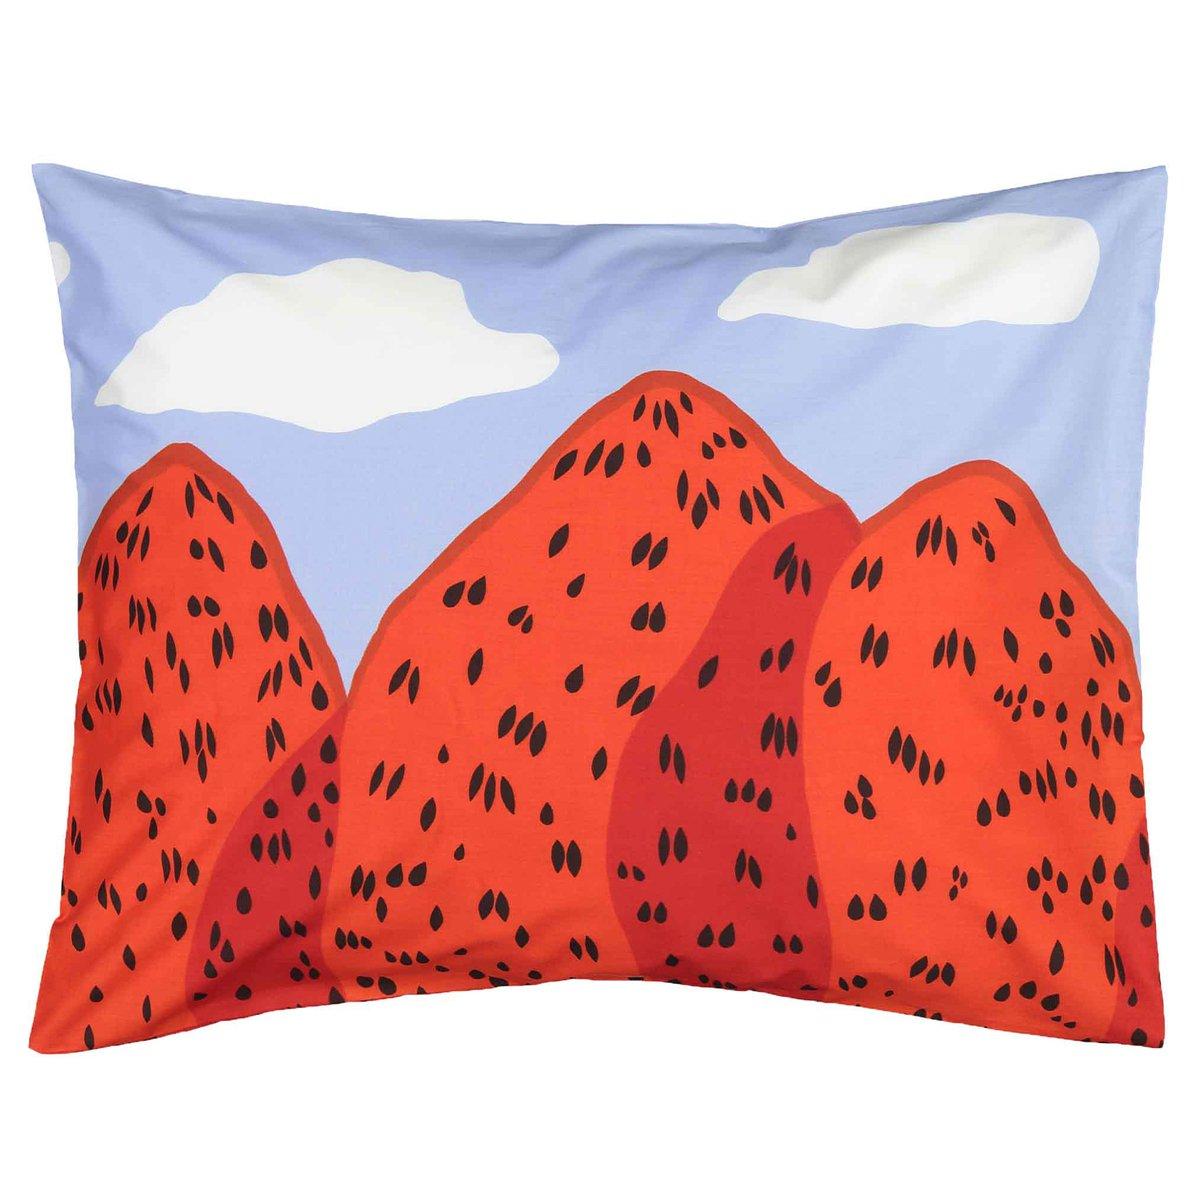 Marimekko Mansikkavuoret Pillowcase 50 X 60 Cm, Blue - Red